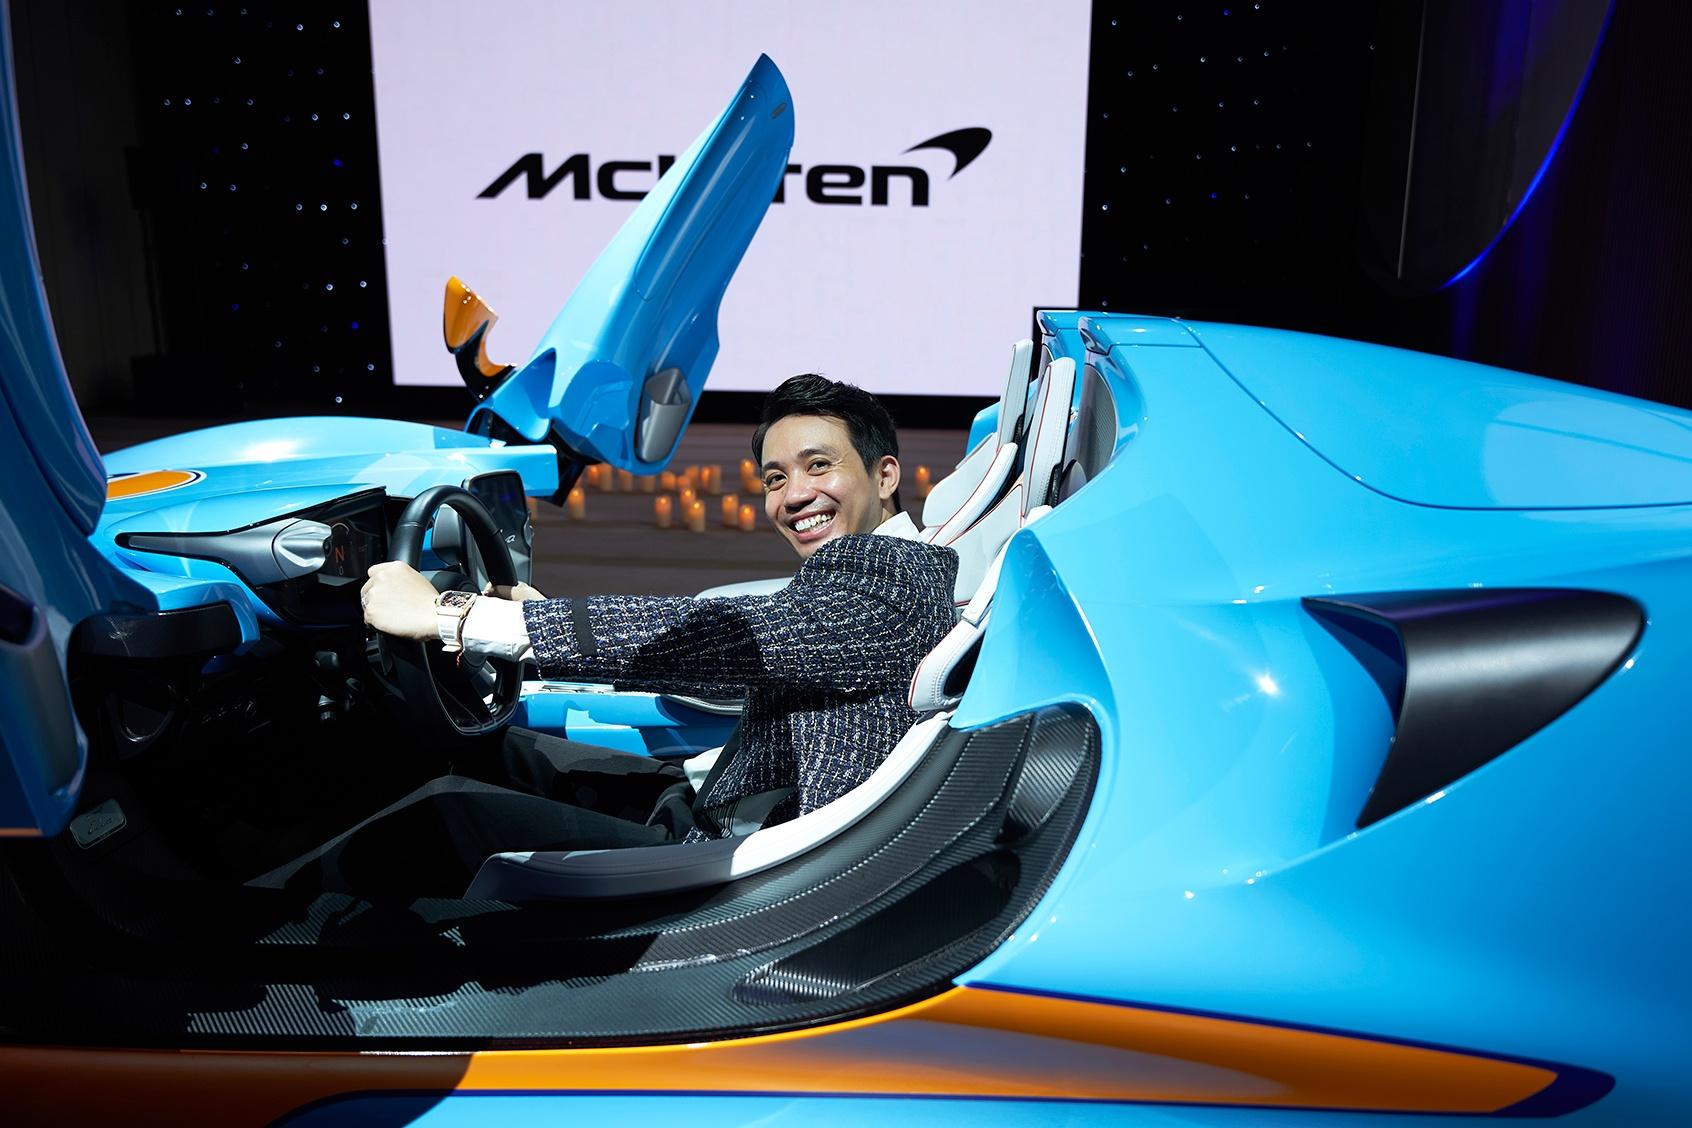 McLaren Elva xuat hien tai TP.HCM cung Minh Nhua anh 3